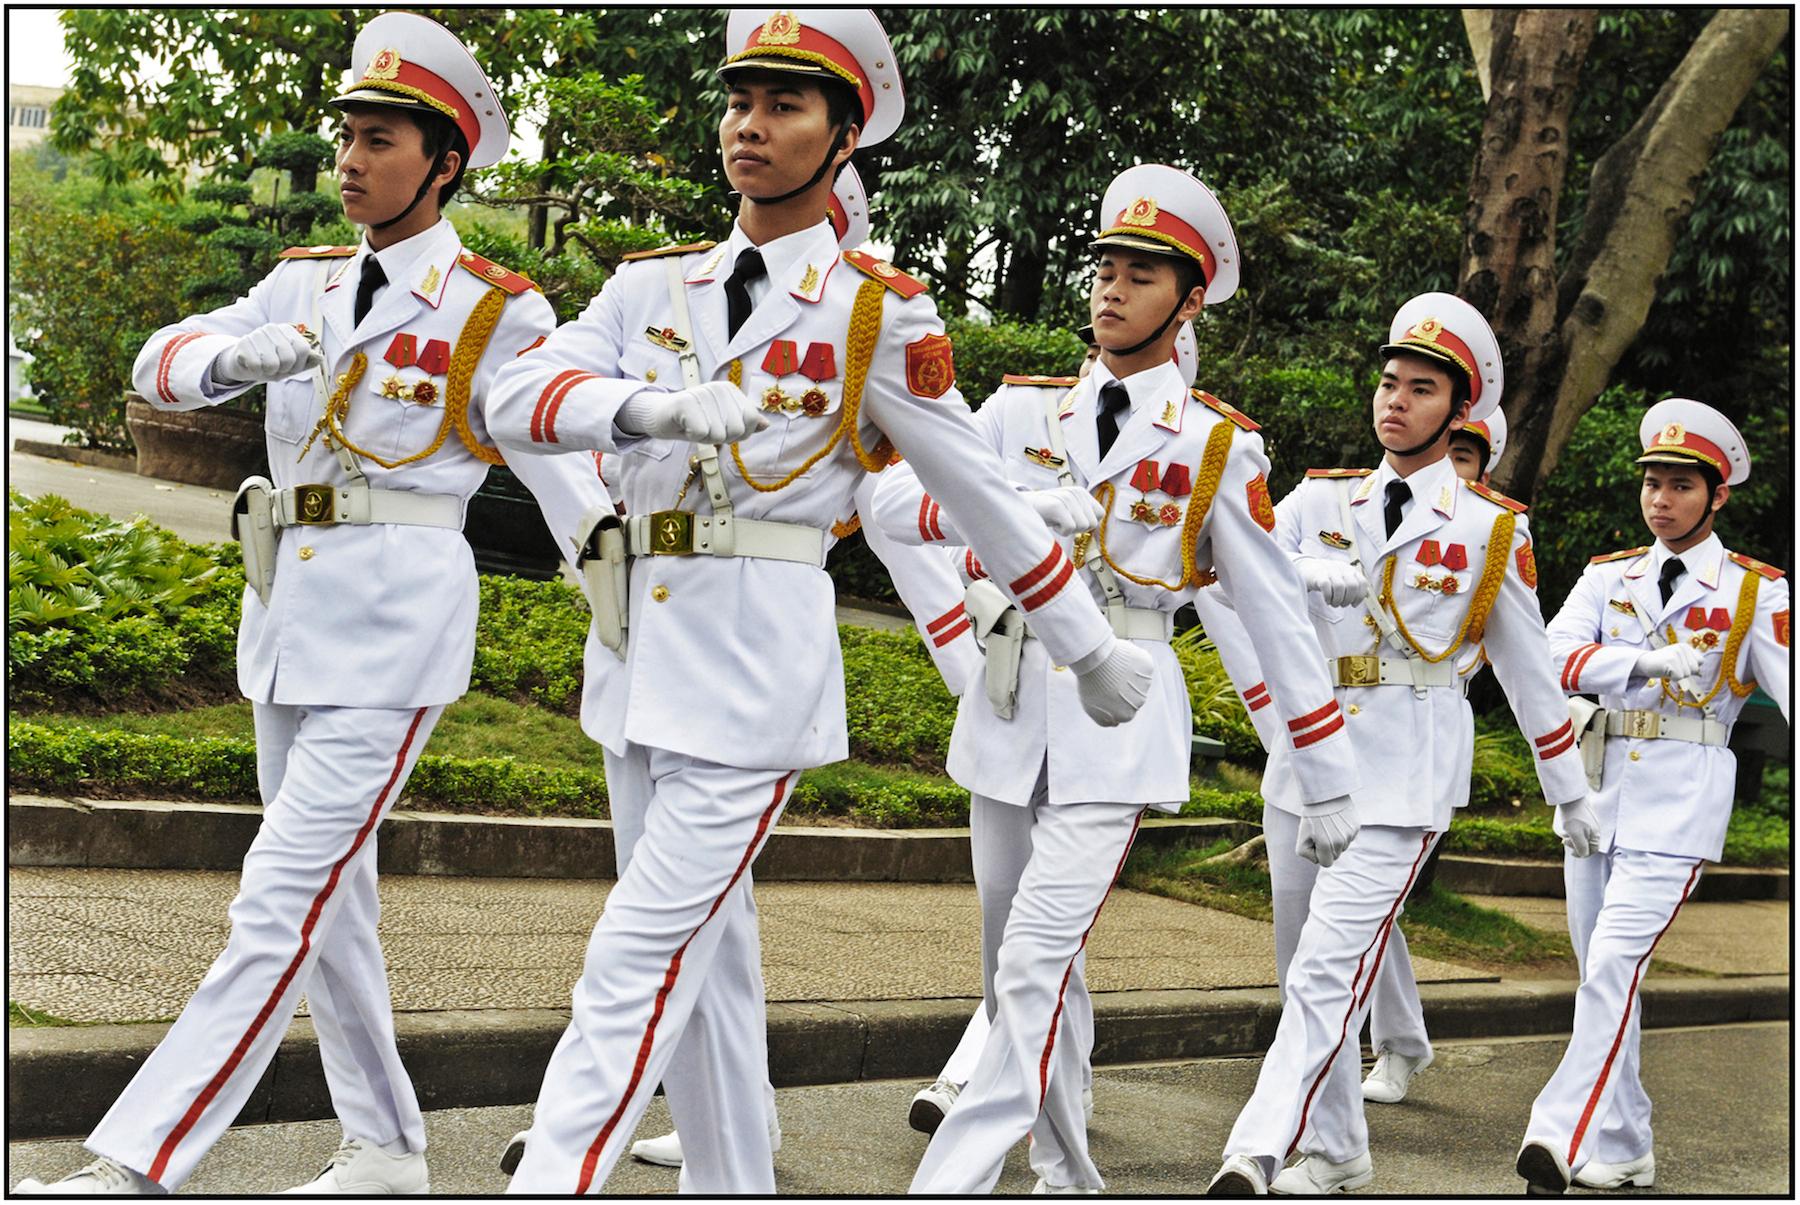 Ho Chi Minh Mausoleum, Hanoi, Feb. 2015. #2955